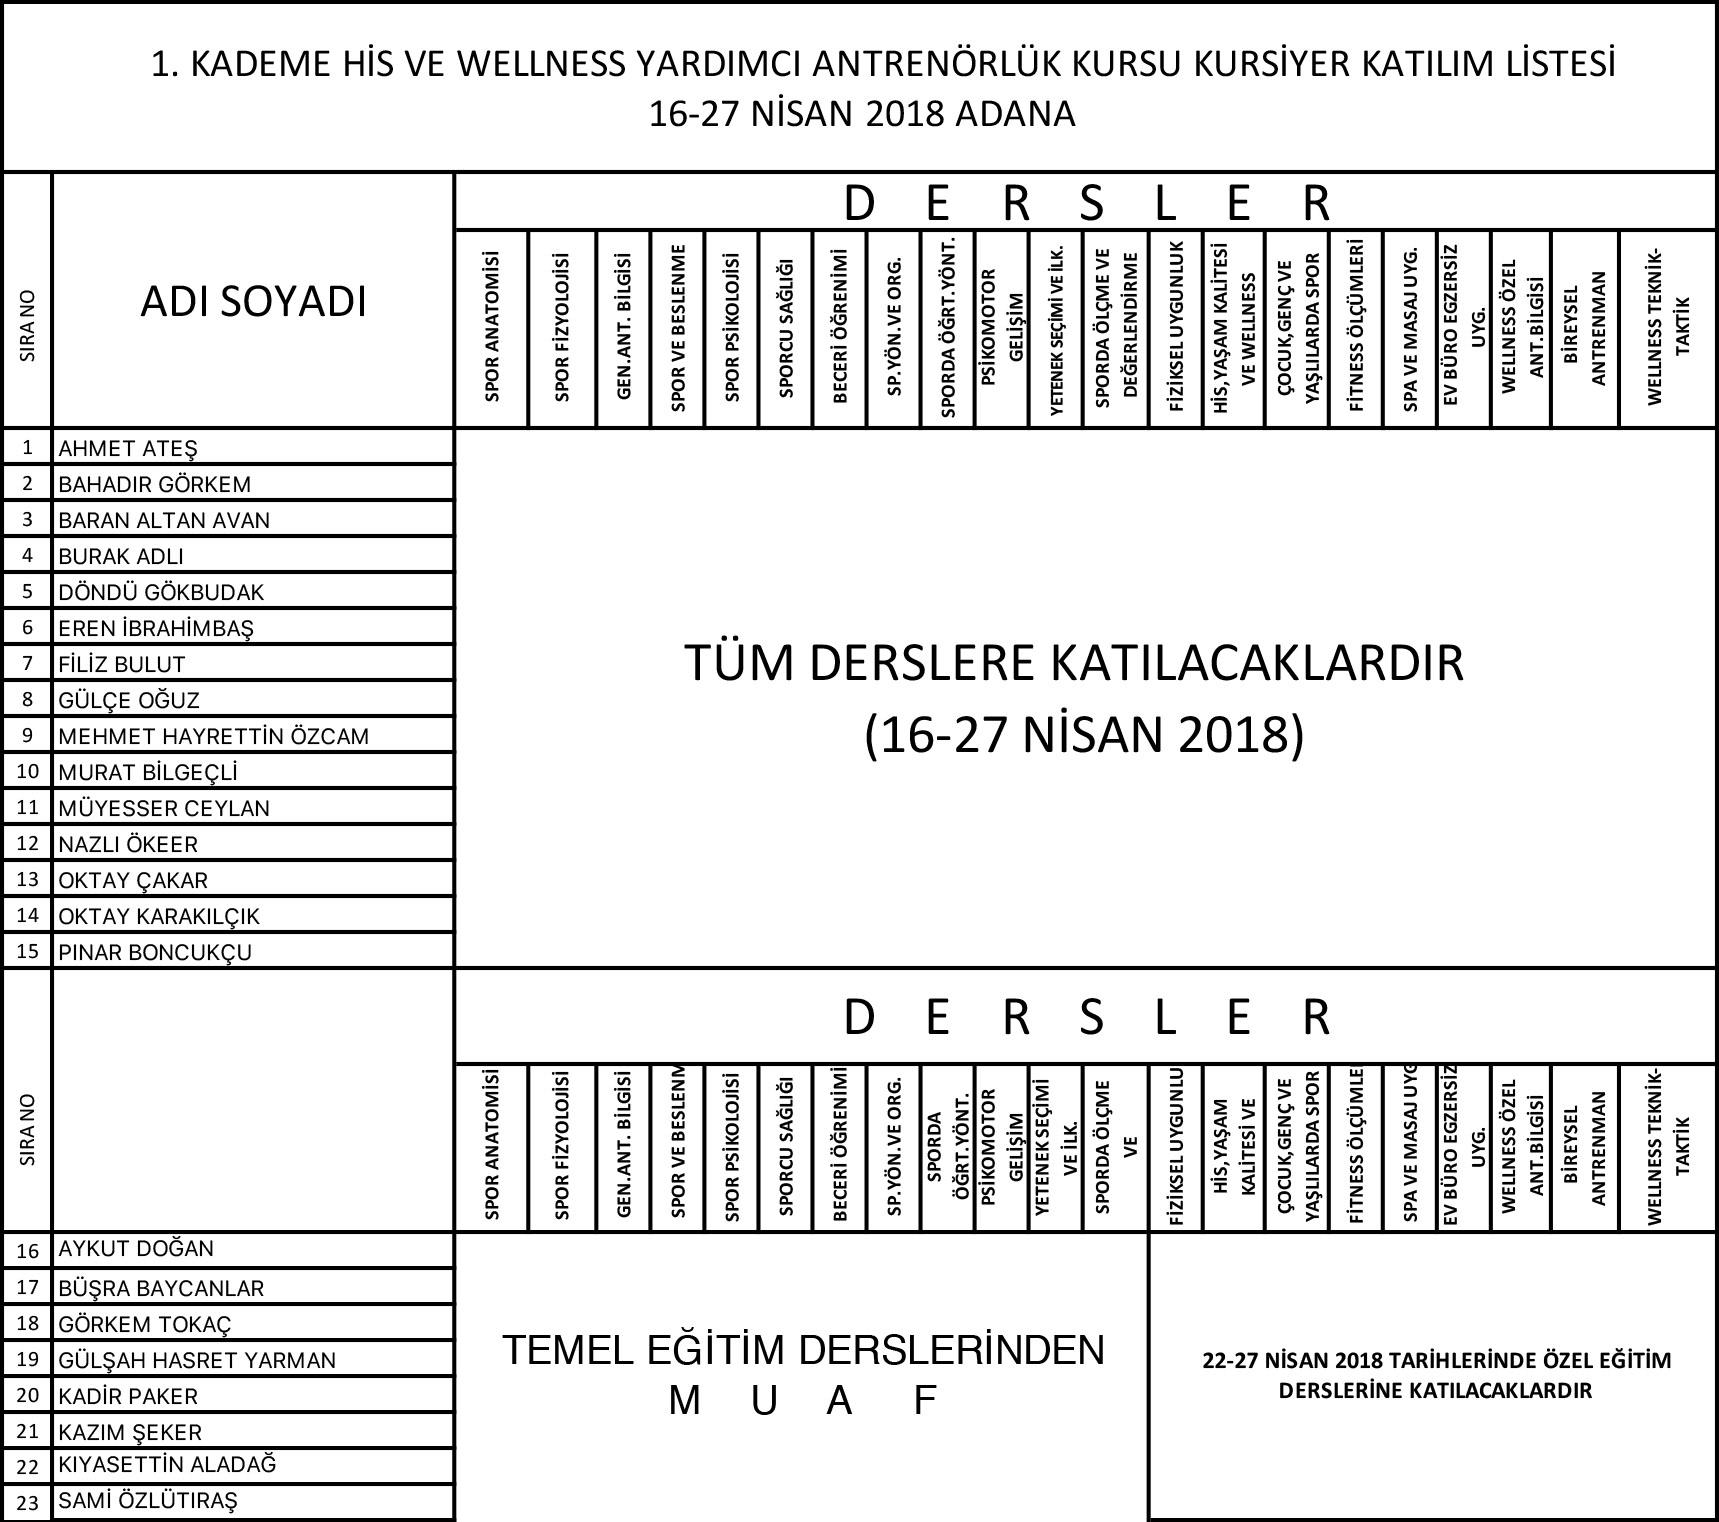 ADANA-16-27-NISAN-WELLNESS-KATILIMCI-LISTESİ